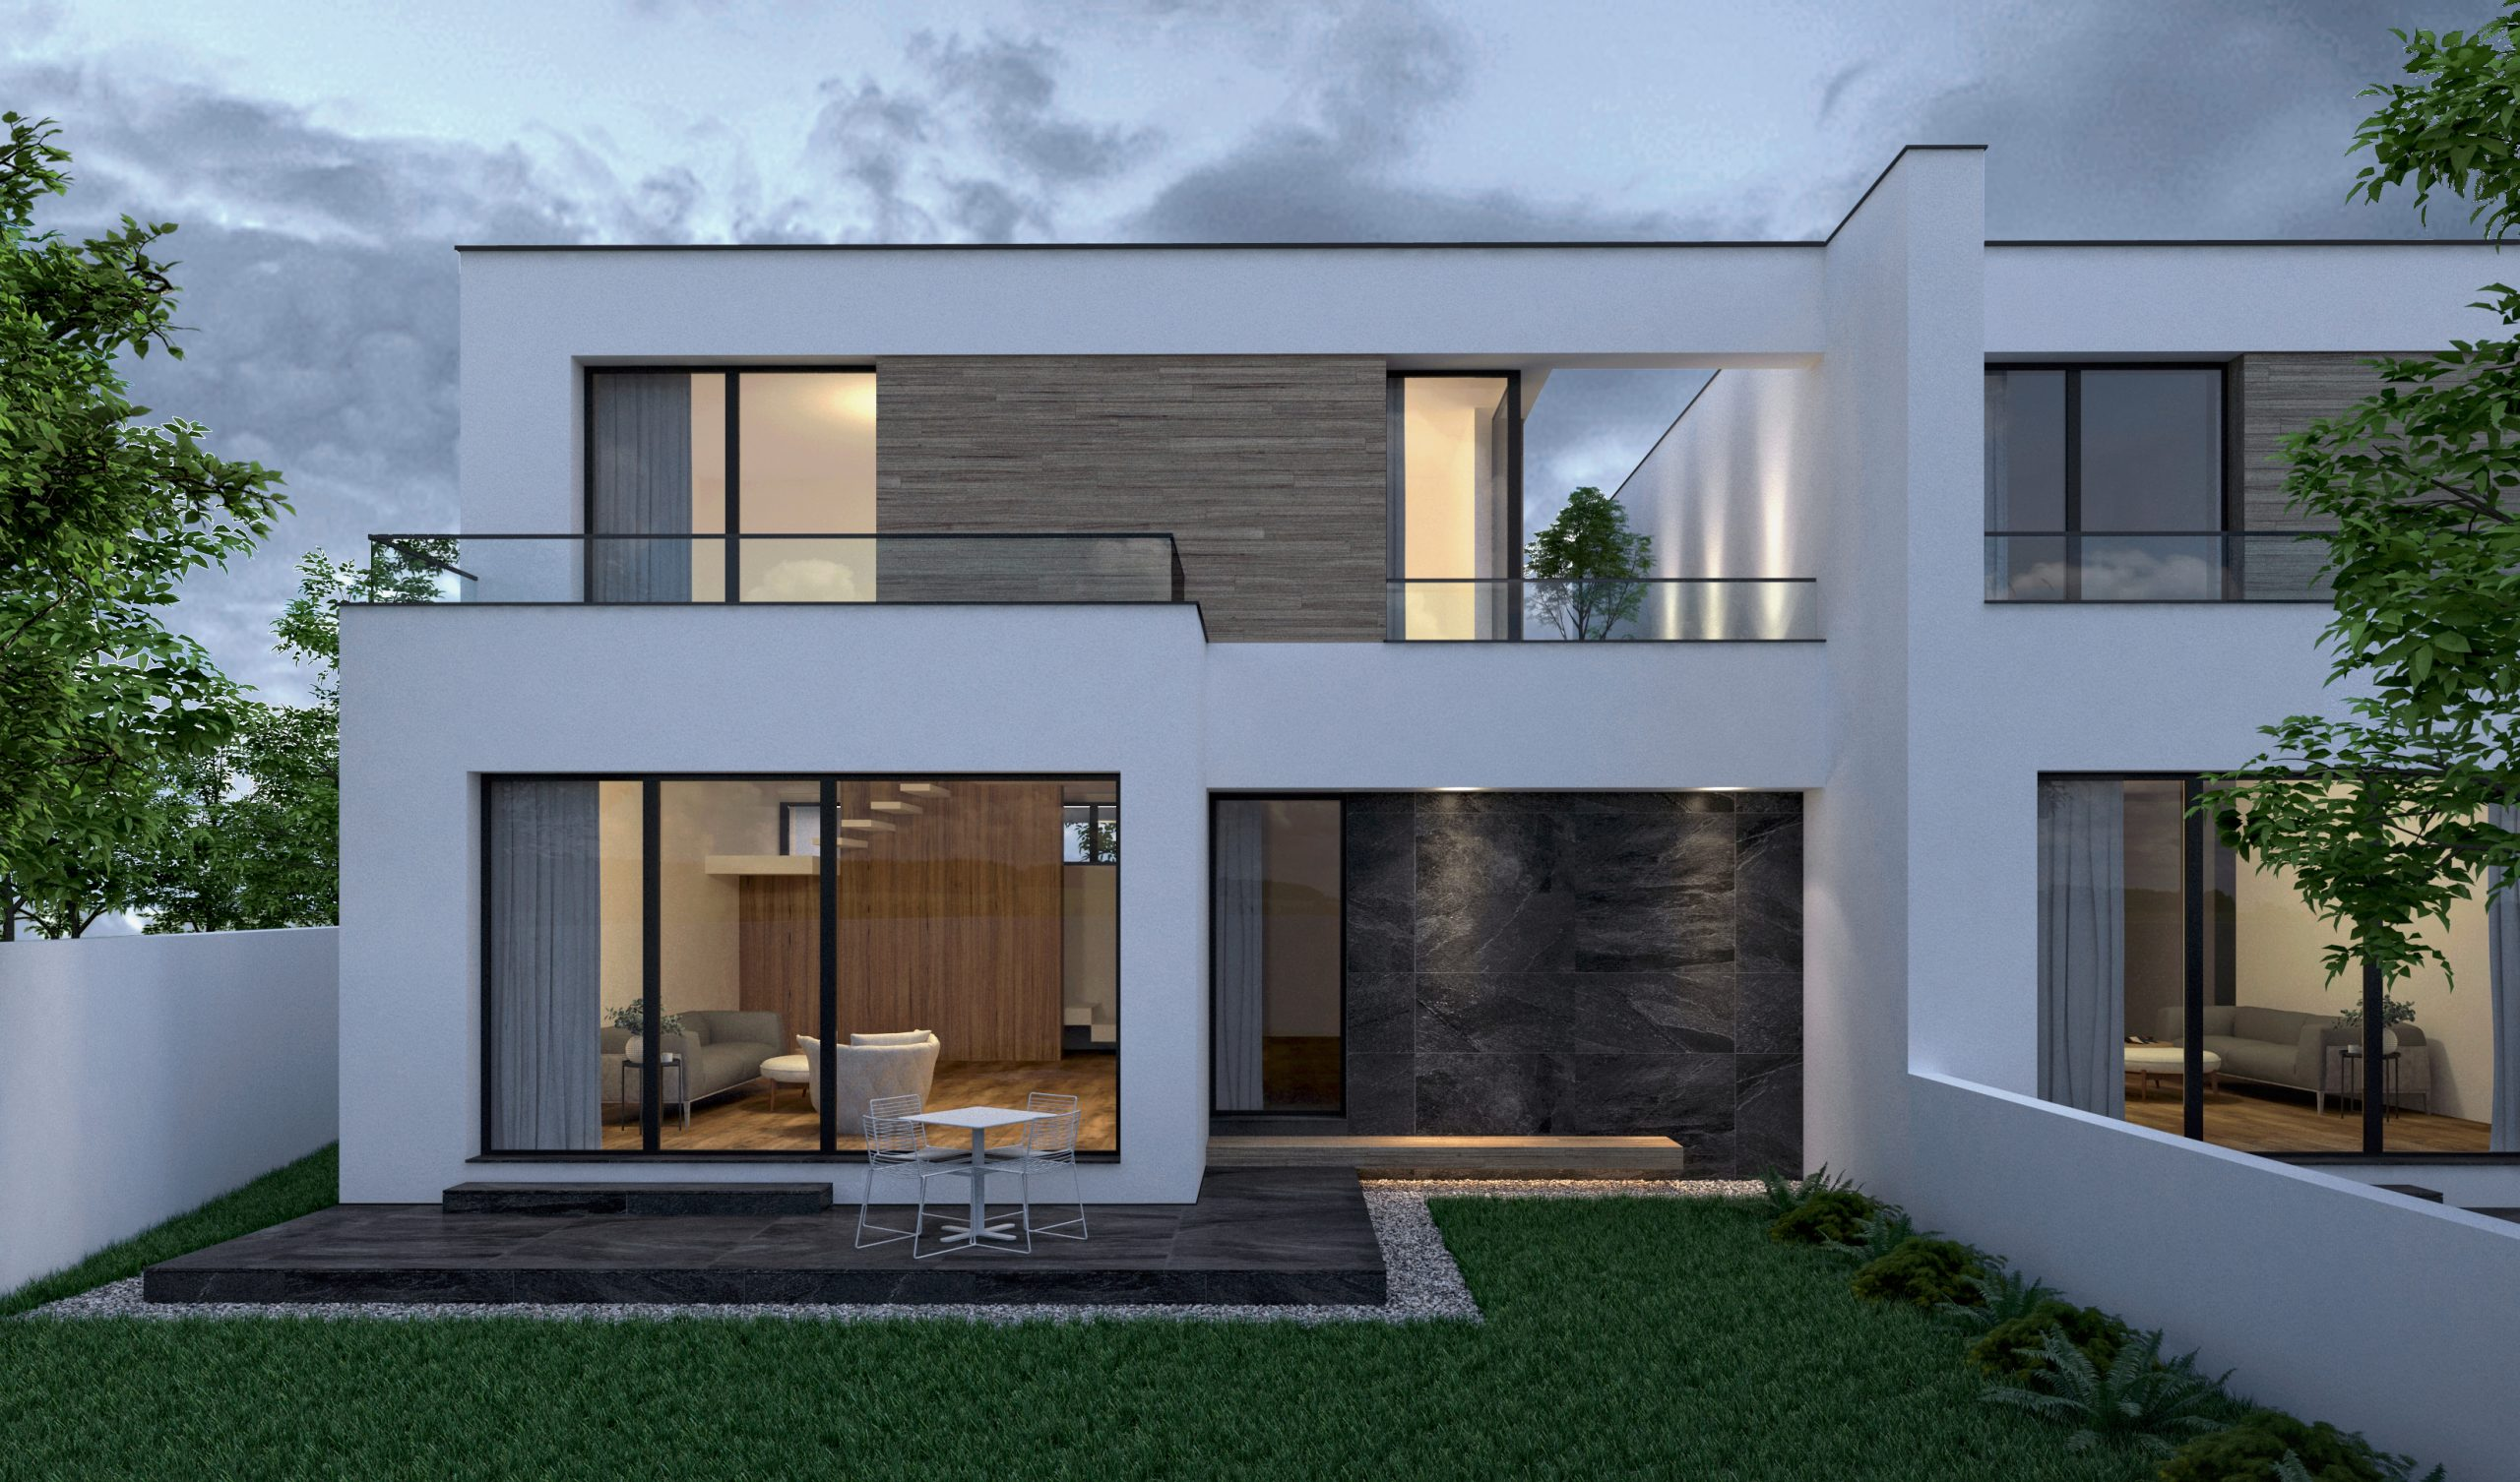 casa-c-05-exterior-rya-lago-mamaia-constanta